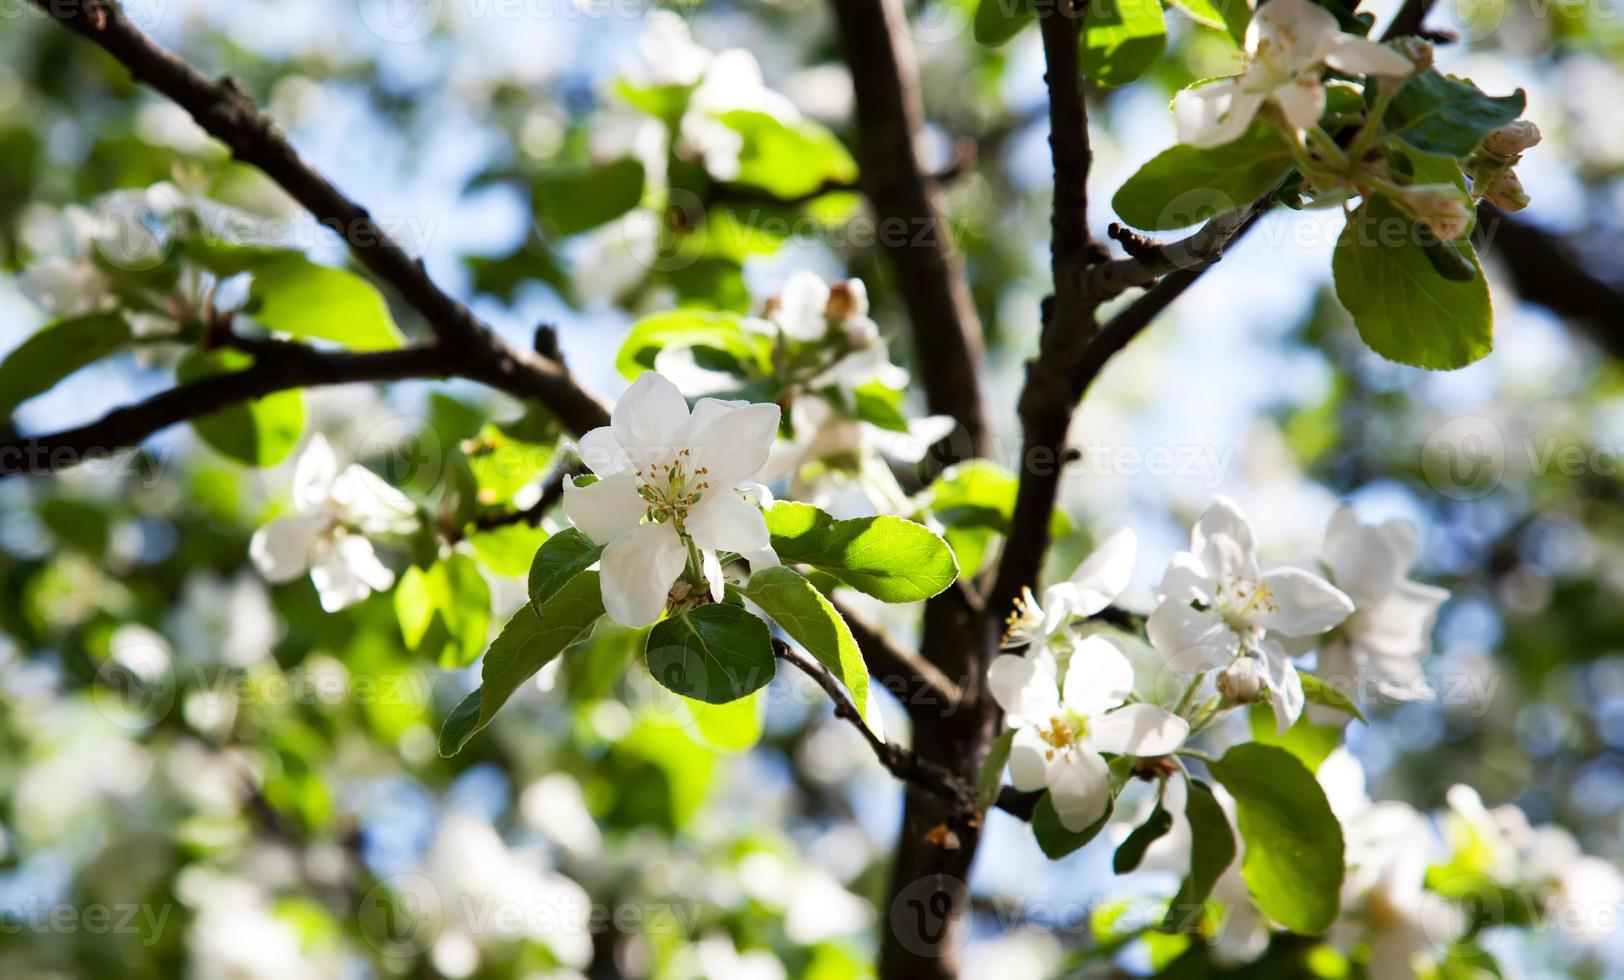 Apple-tree blossom photo